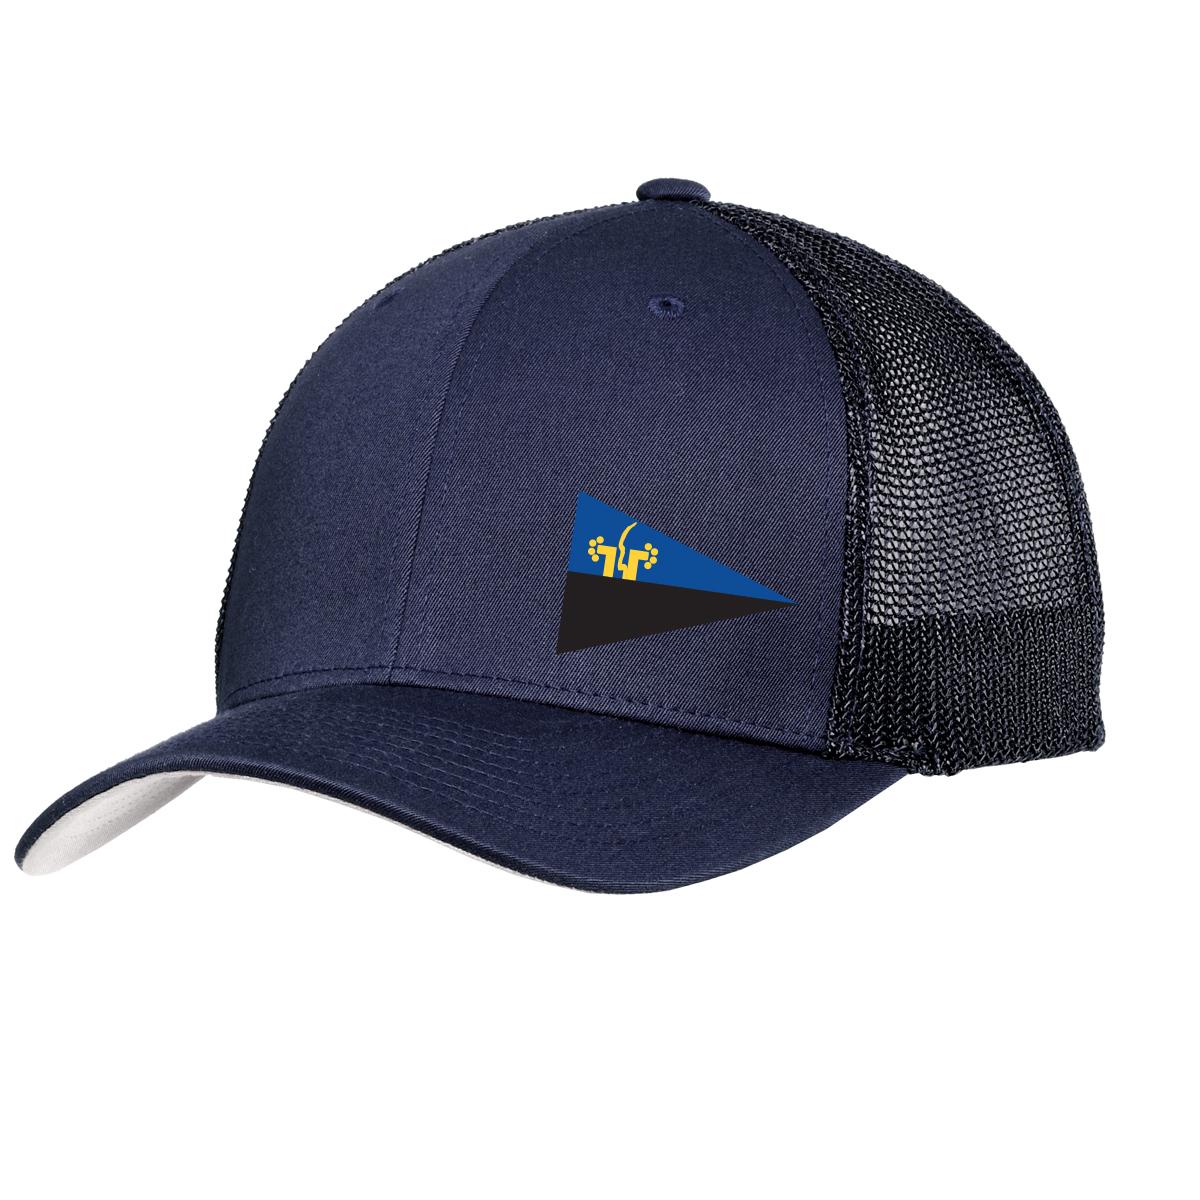 Mudratz - Flex Fit Cap (MDR901)